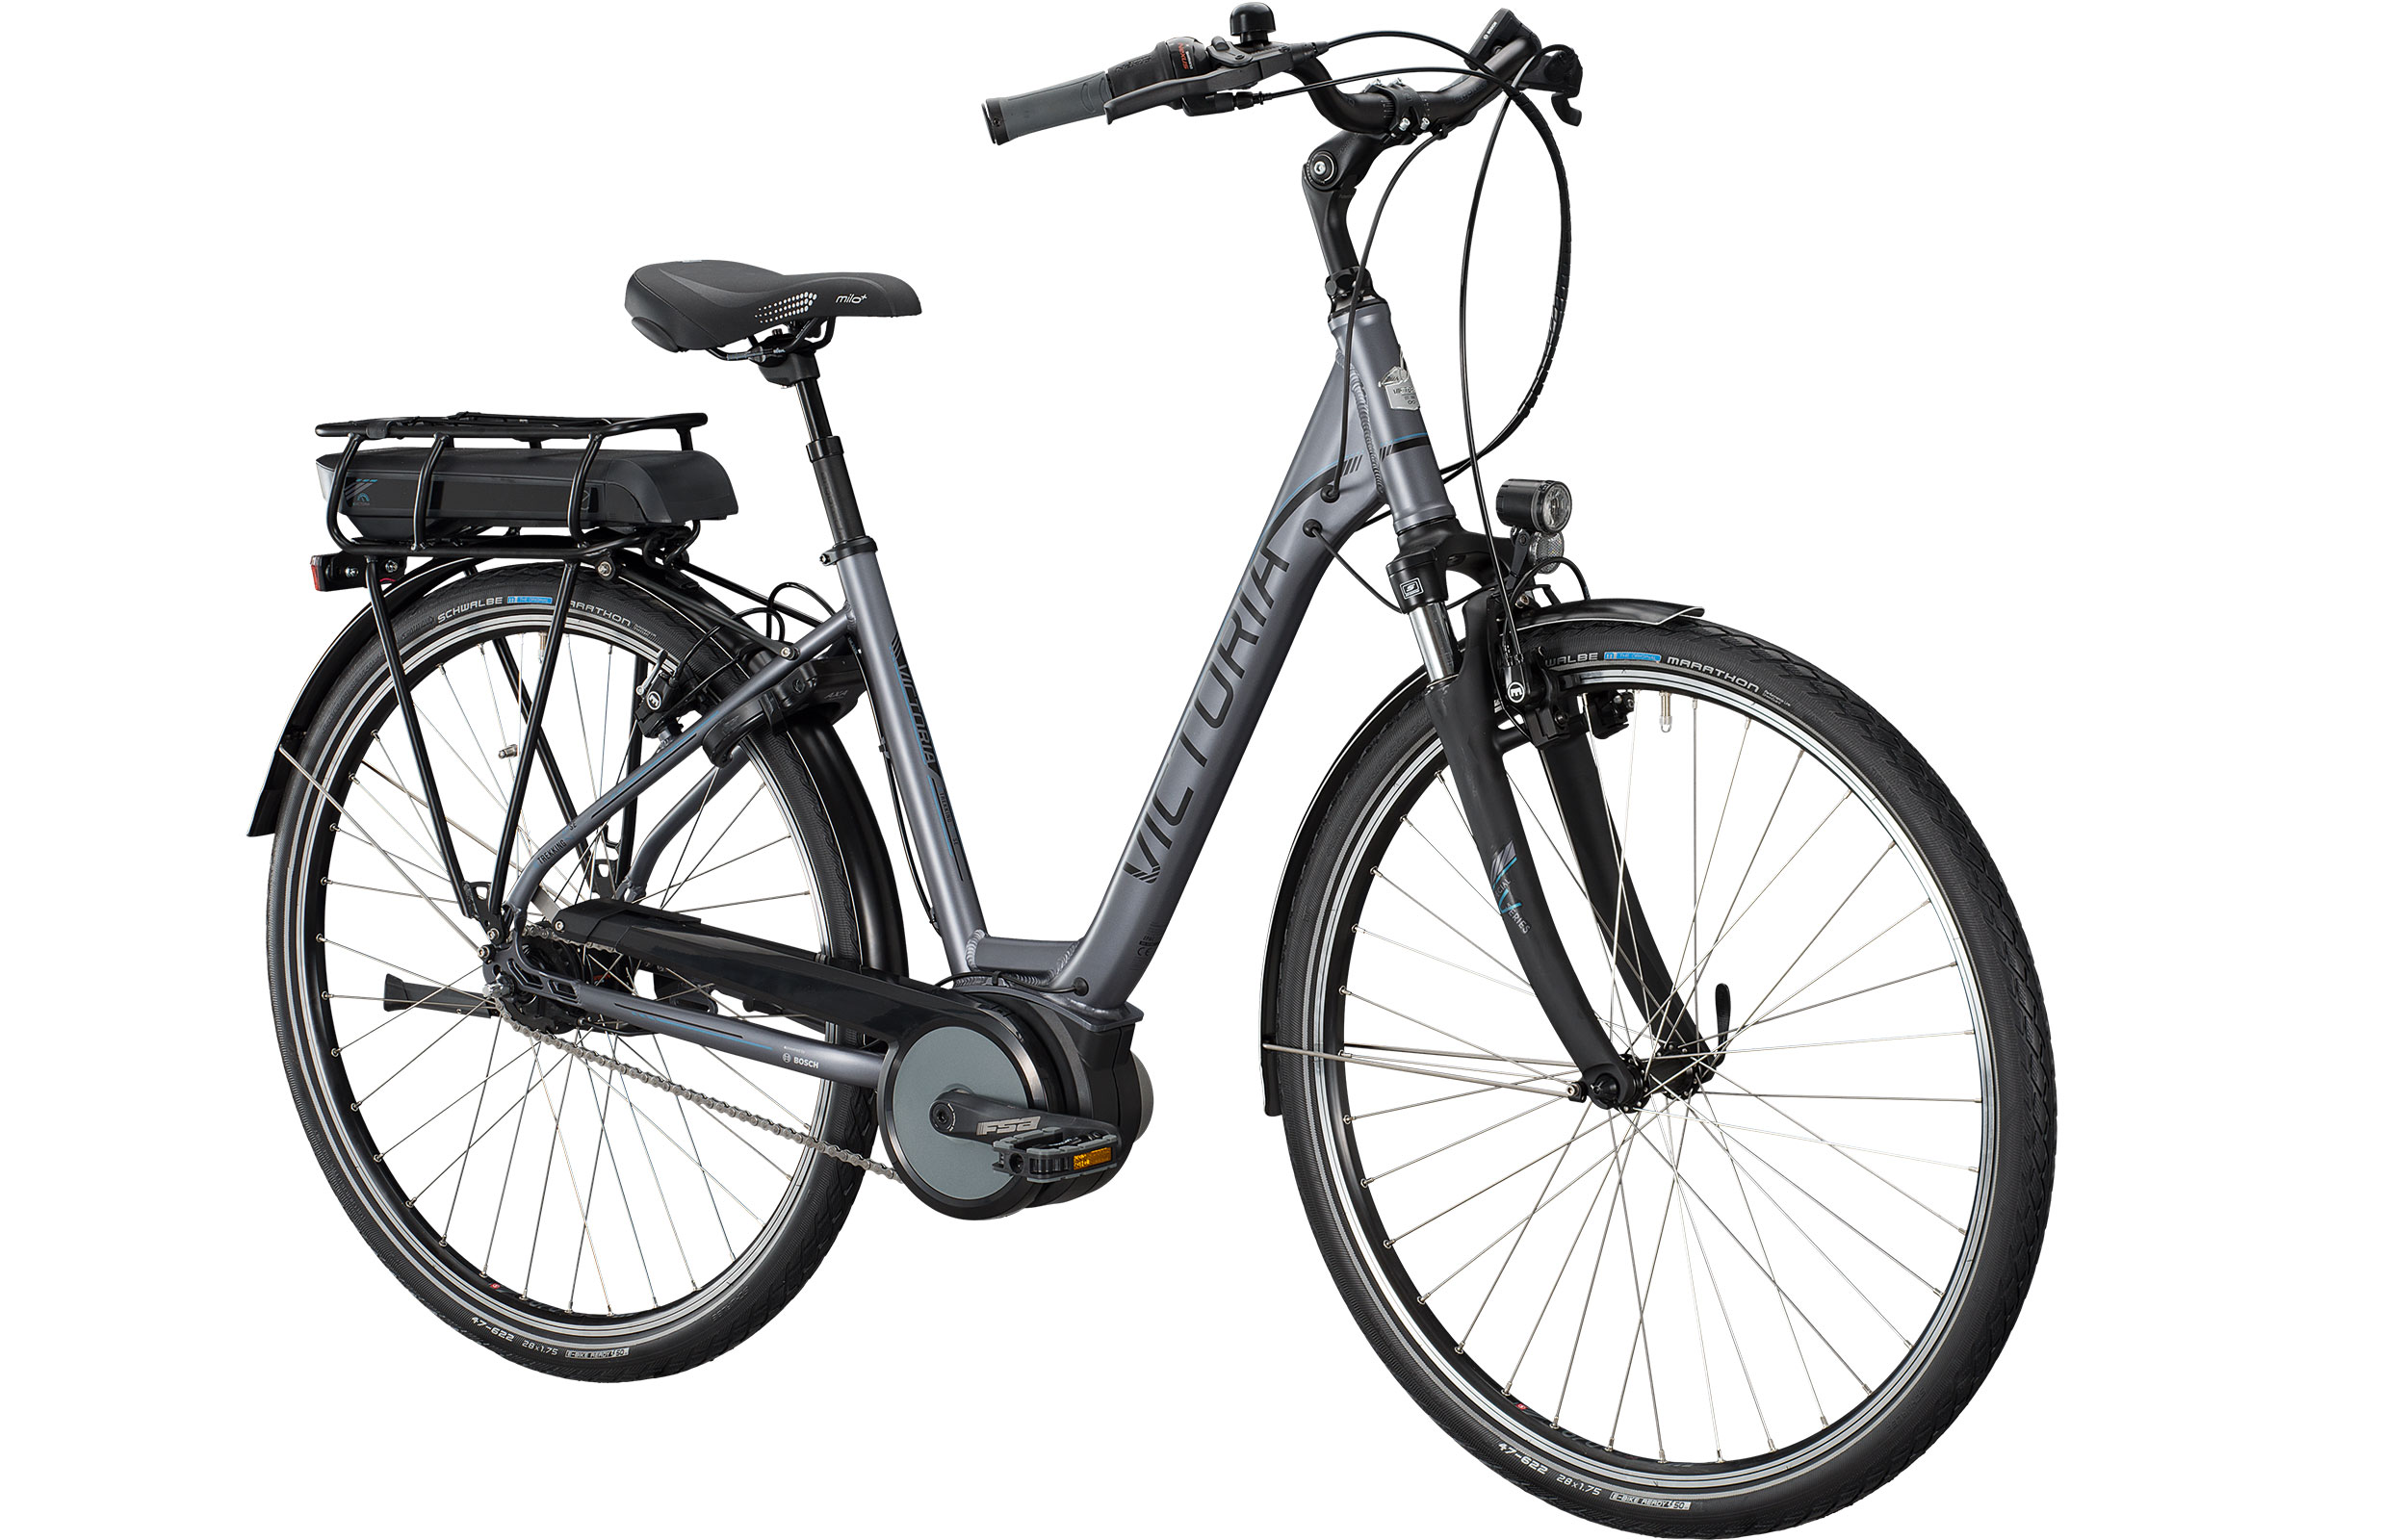 victoria e bike 5 7 se bosch motor 400 watt accu modelj. Black Bedroom Furniture Sets. Home Design Ideas